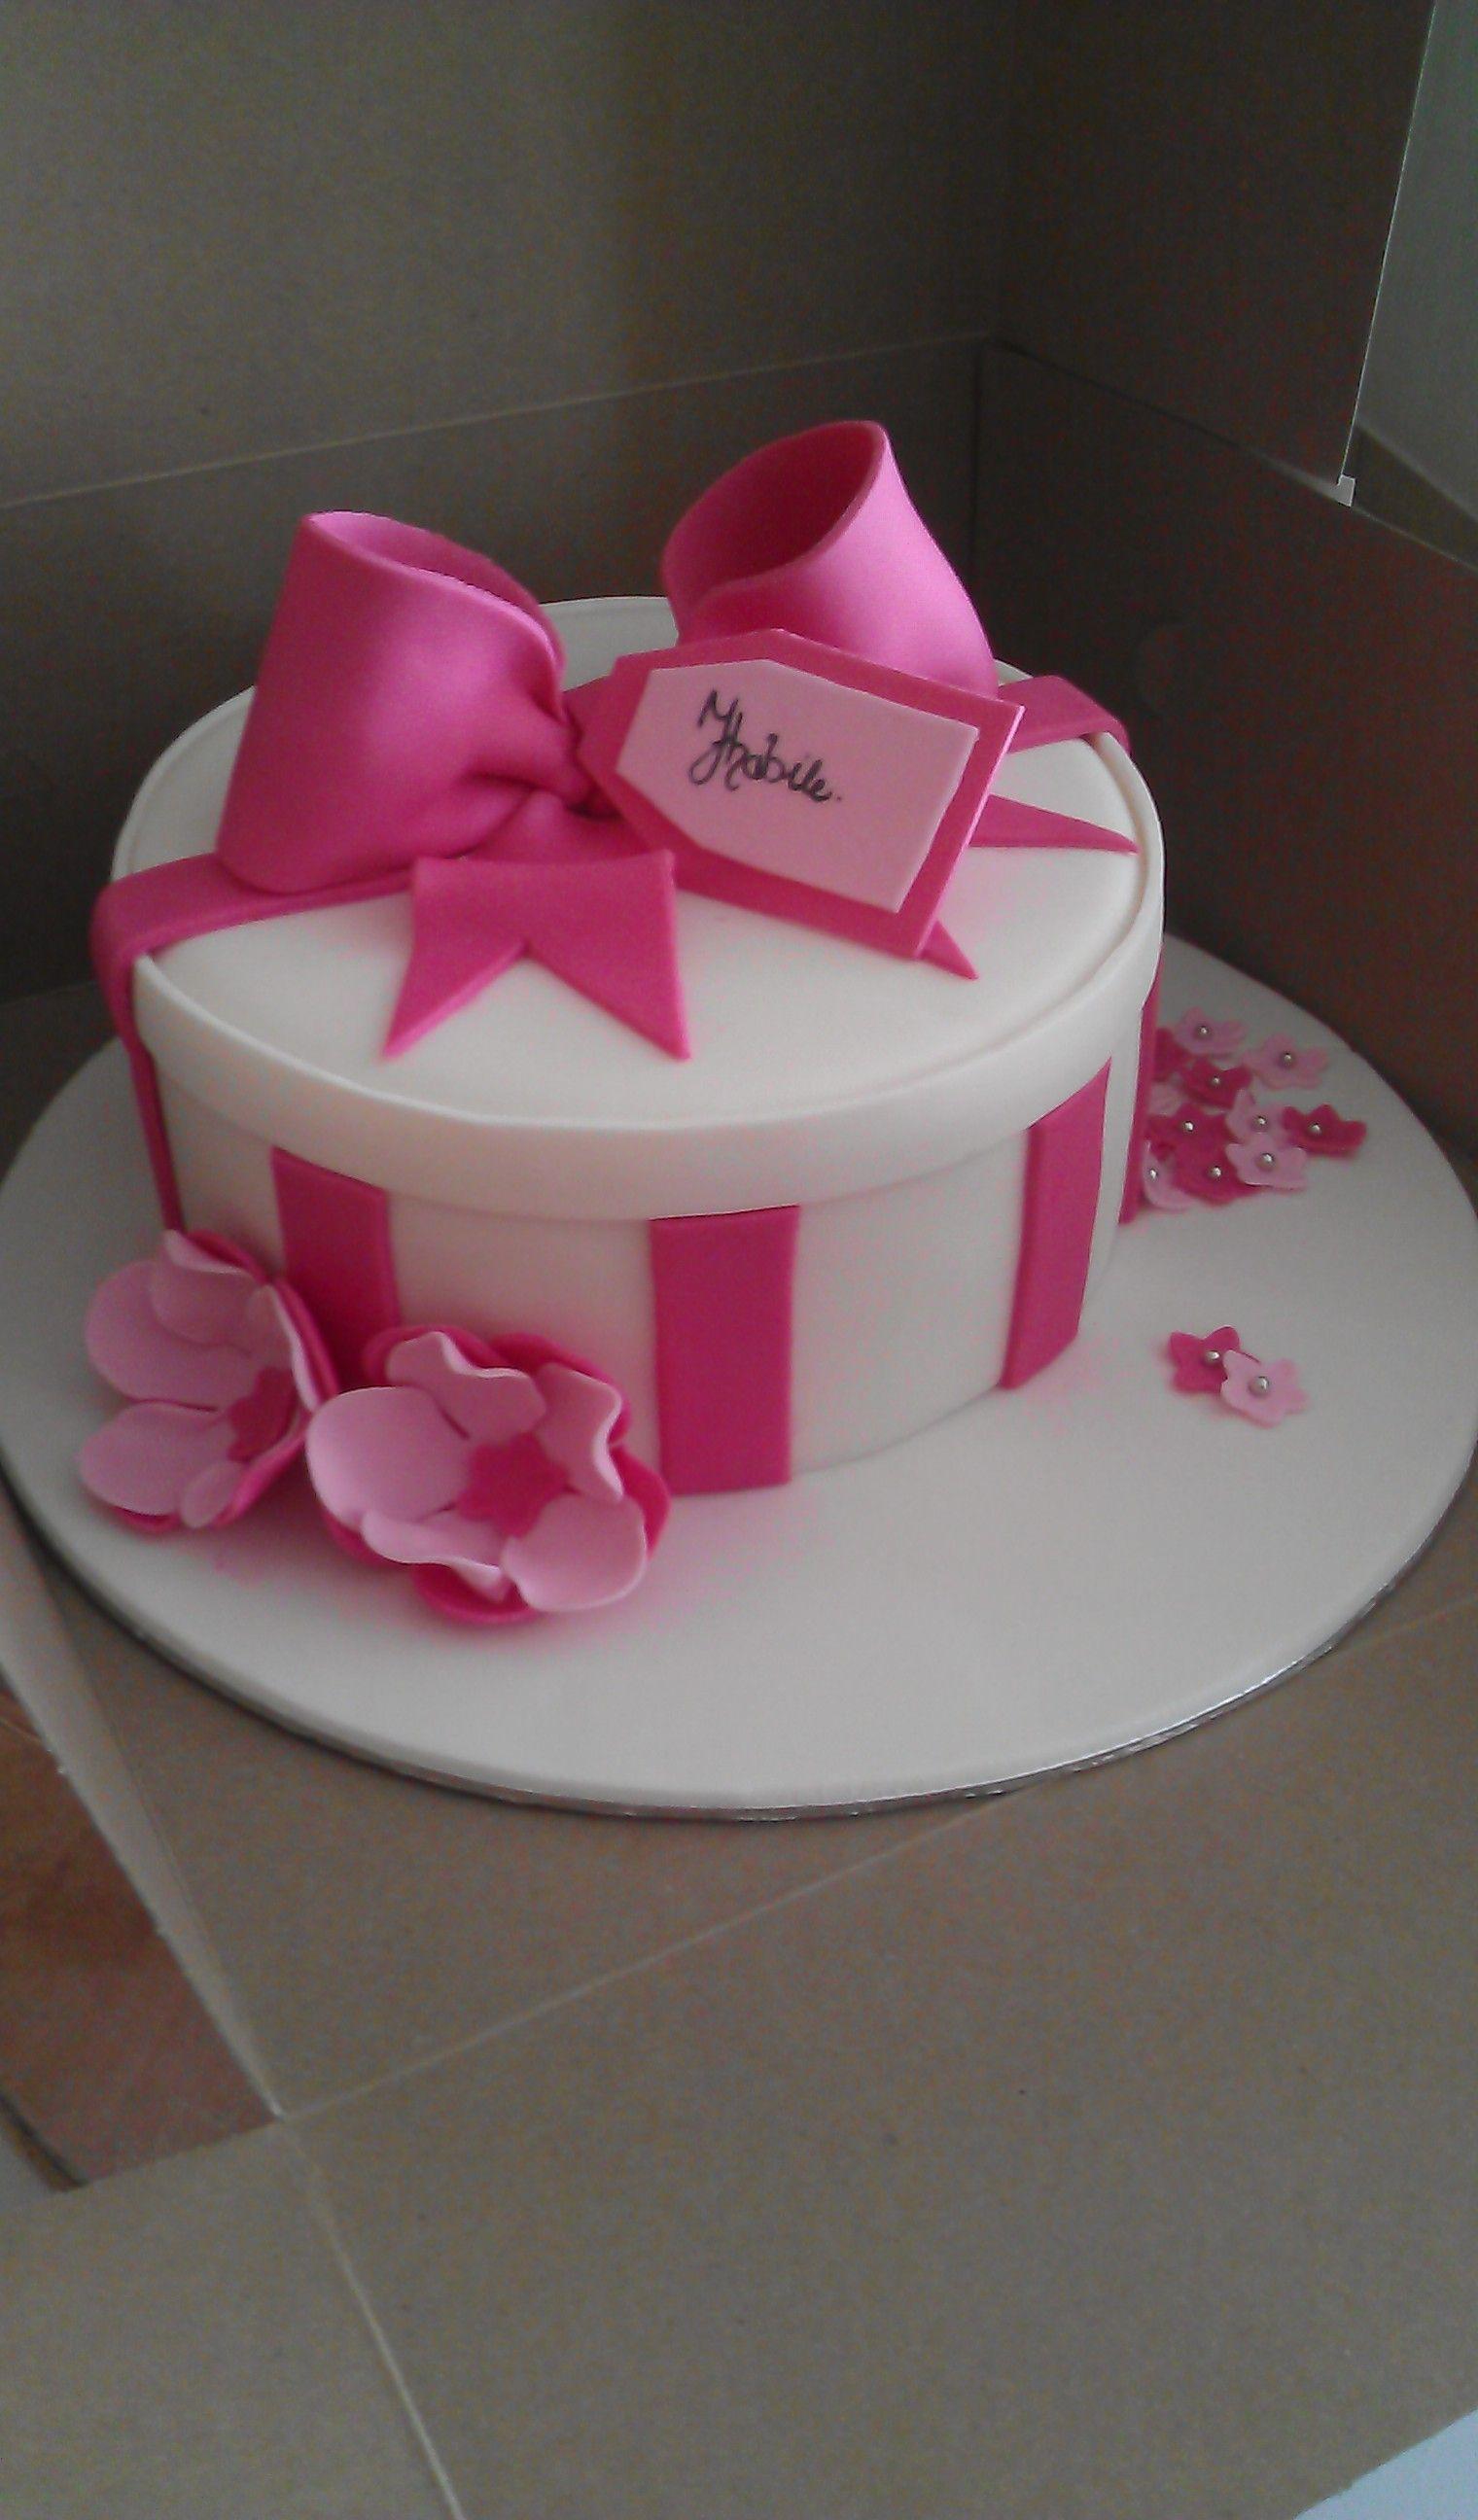 Magnificent Round T Box Birthday Cake Gift Box Cakes Birthday Cakes For Funny Birthday Cards Online Hendilapandamsfinfo